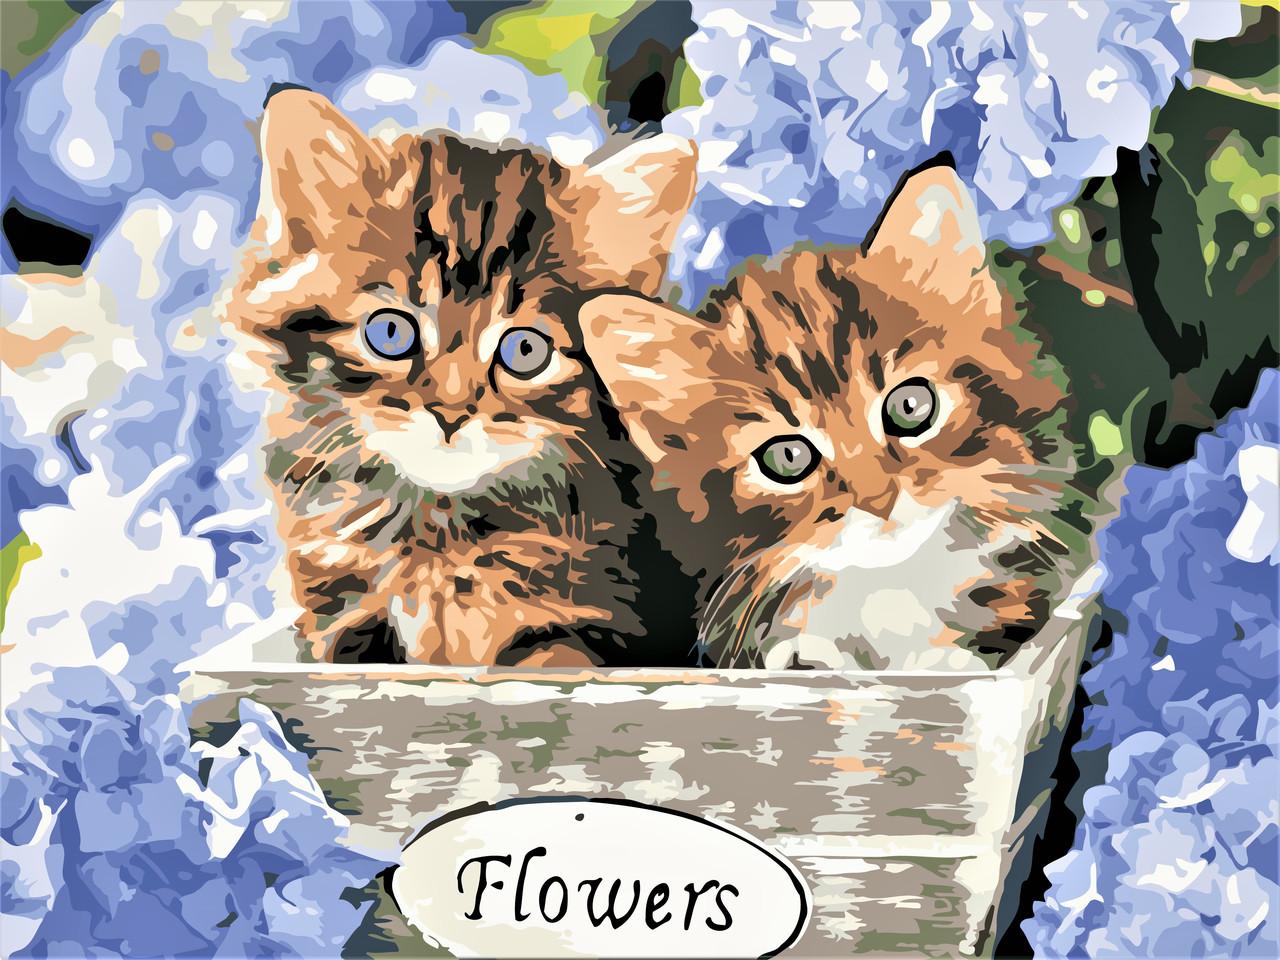 Картины по номерам Котята в цветах ArtStory AS0597 30 х 40 см (без коробки)